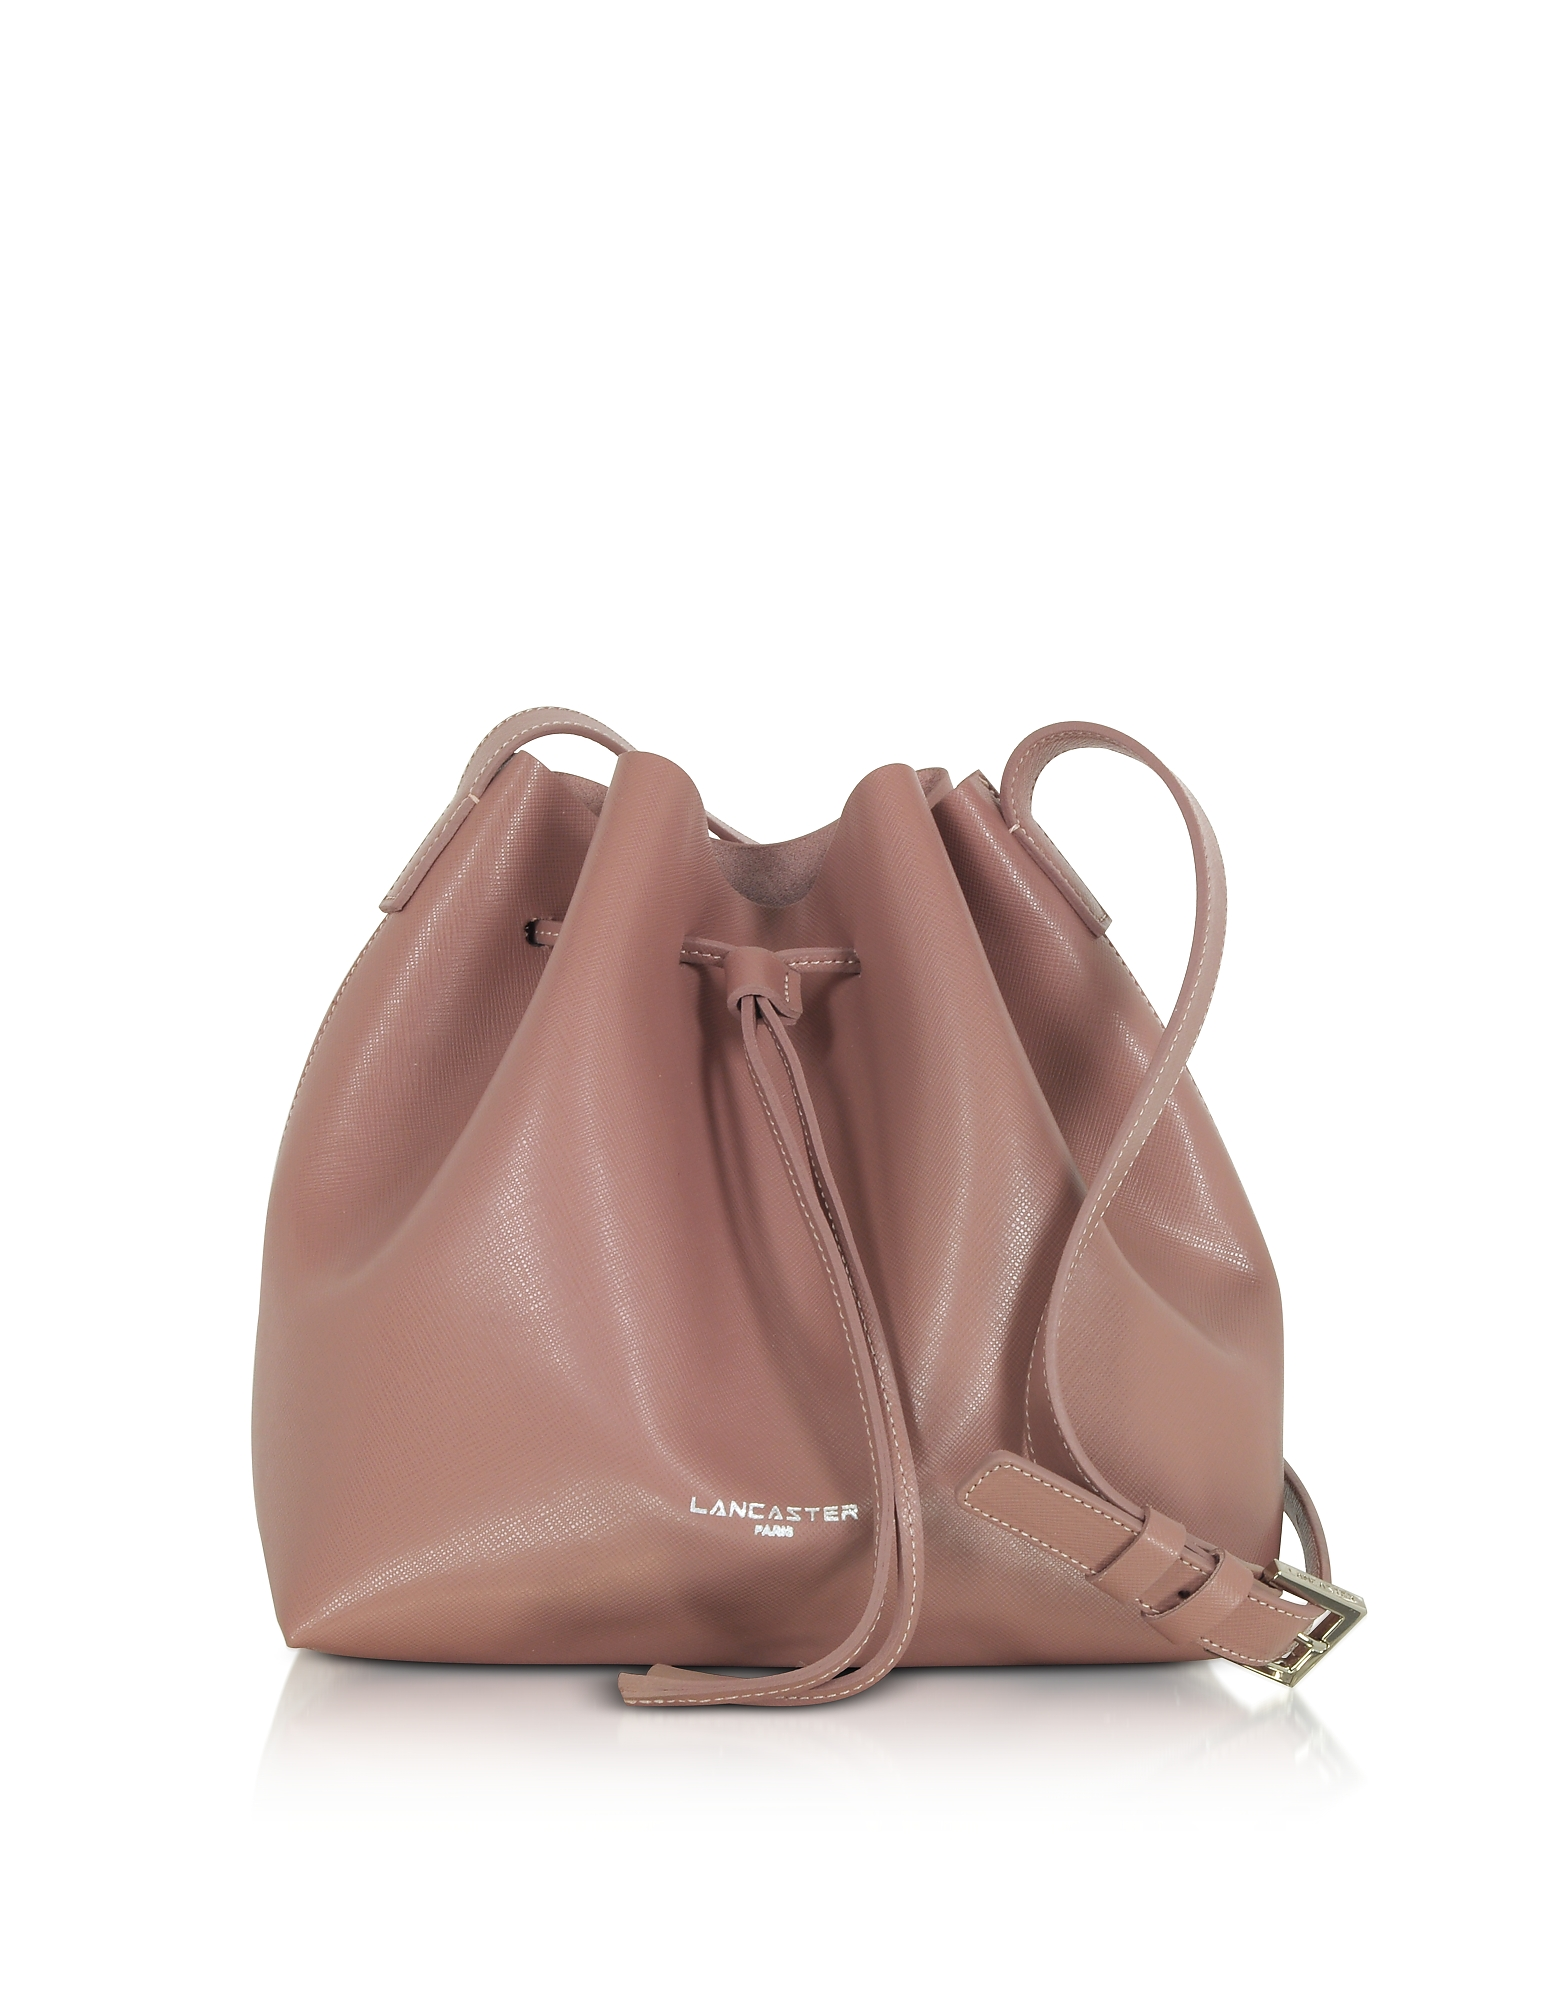 Lancaster Paris Handbags, Pur & Element Saffiano Leather Small Bucket Bag